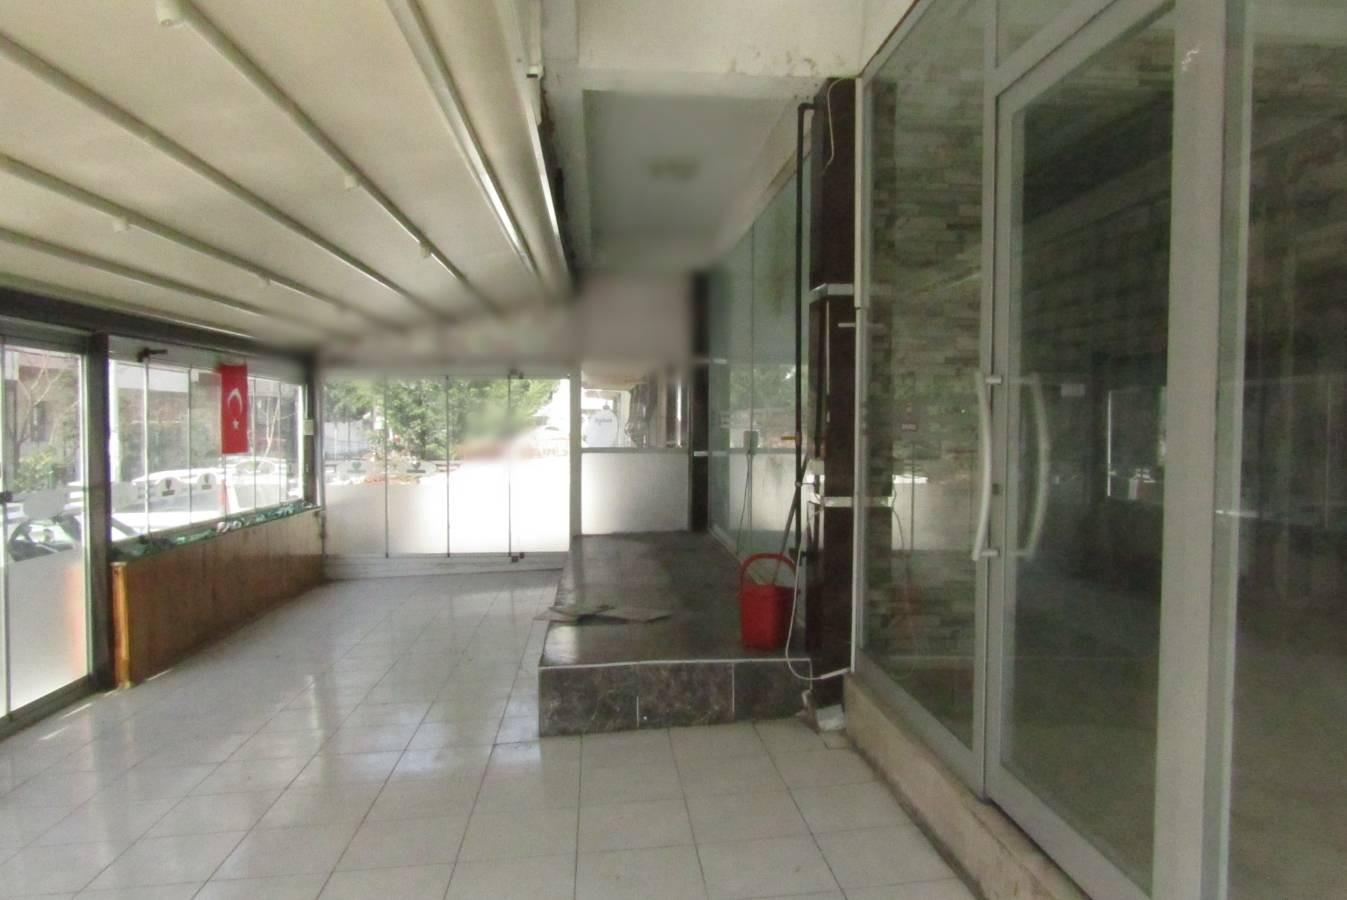 SR EMLAK'TAN K.KARABEKİR MAH'DE 150 m² KÖŞEBAŞI KİRALIK DÜKKAN